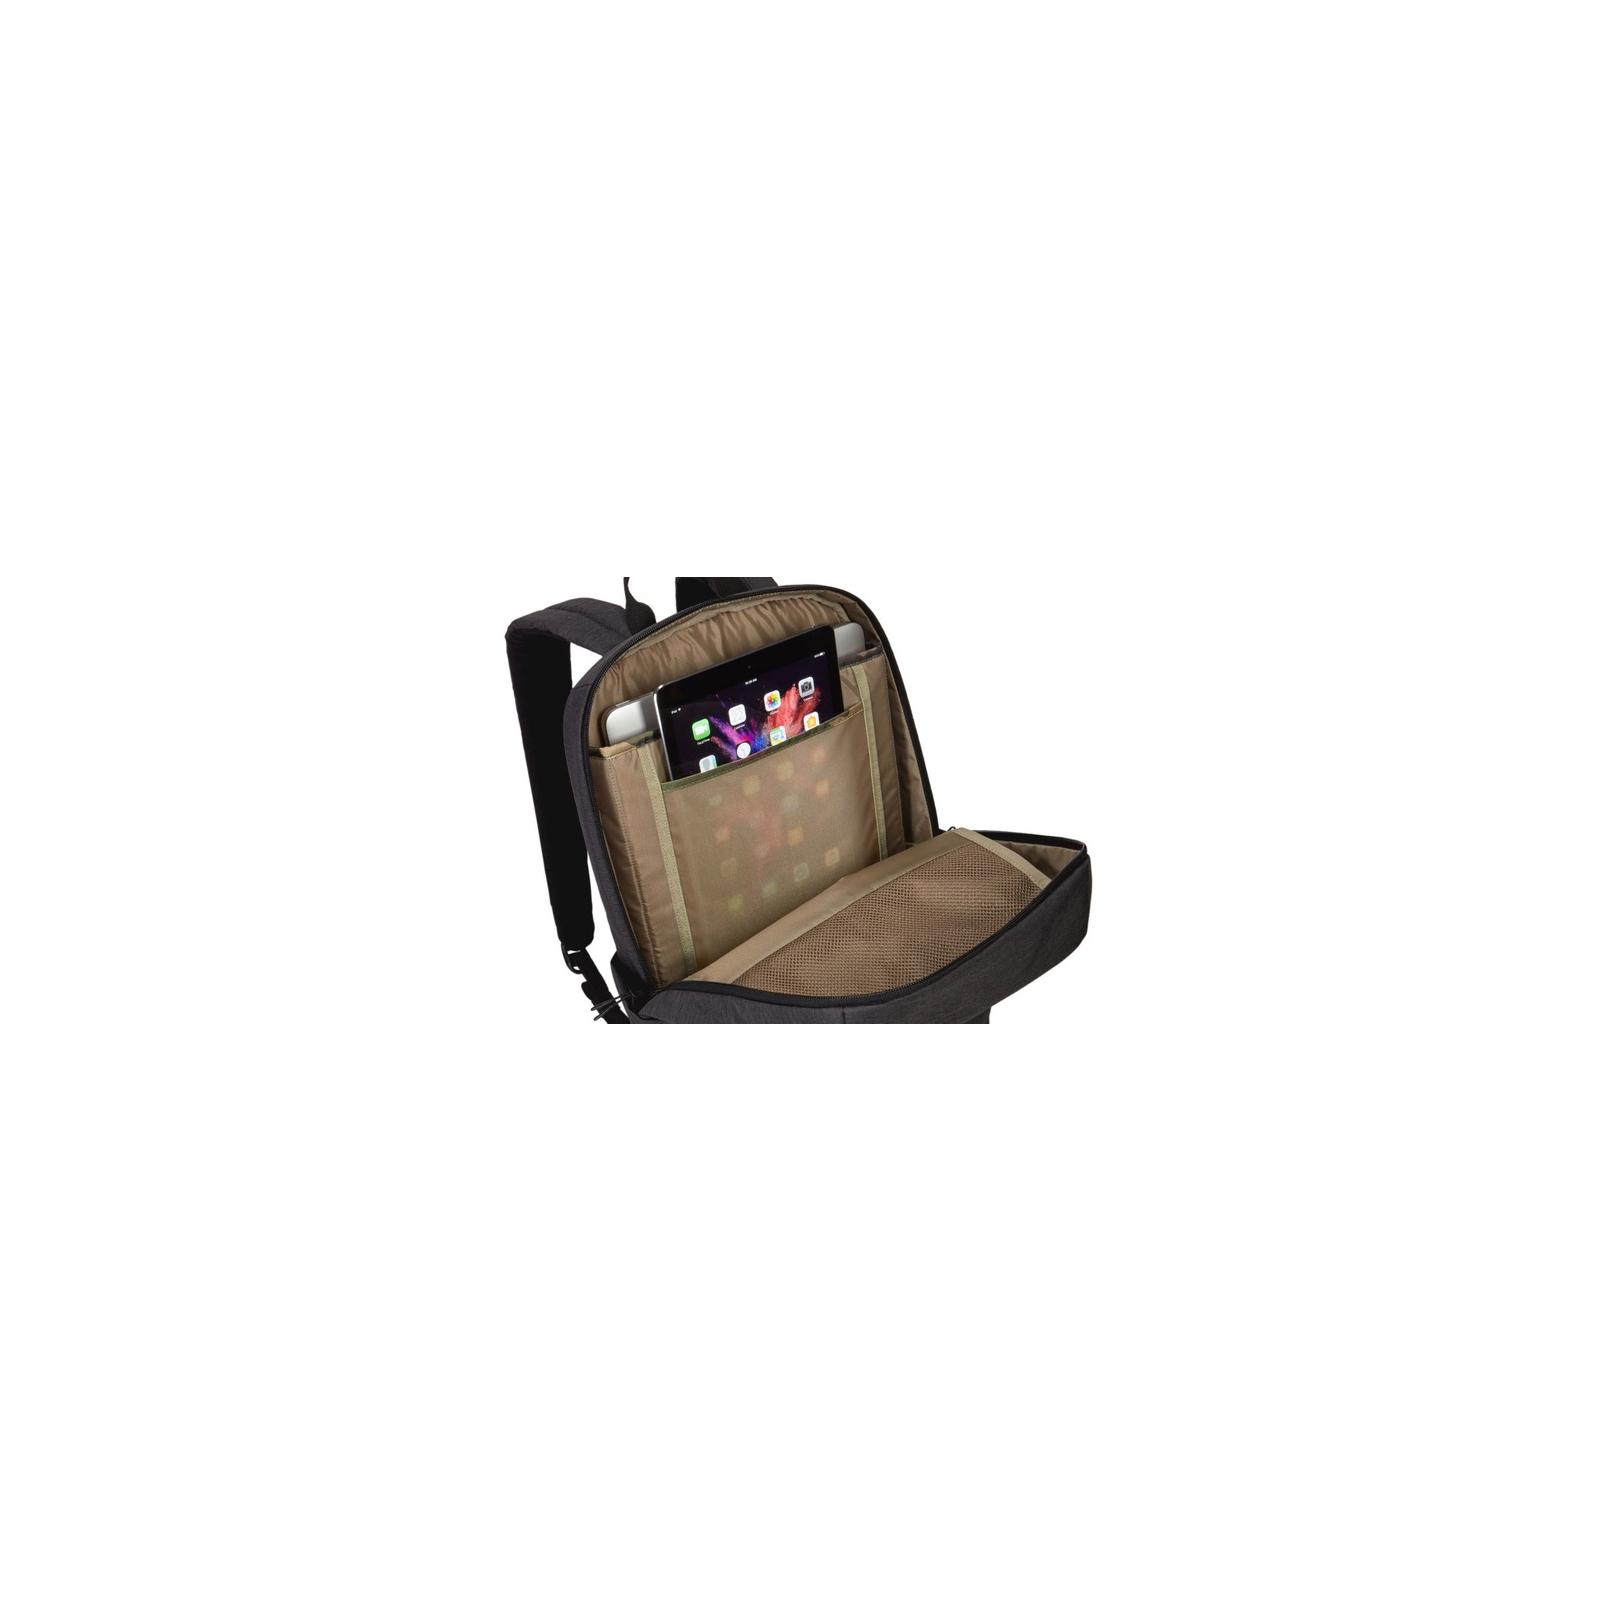 "Рюкзак для ноутбука Thule 15"" Lithos 20L Rooibos/Forest Night TLBP-116 (3203824) изображение 4"